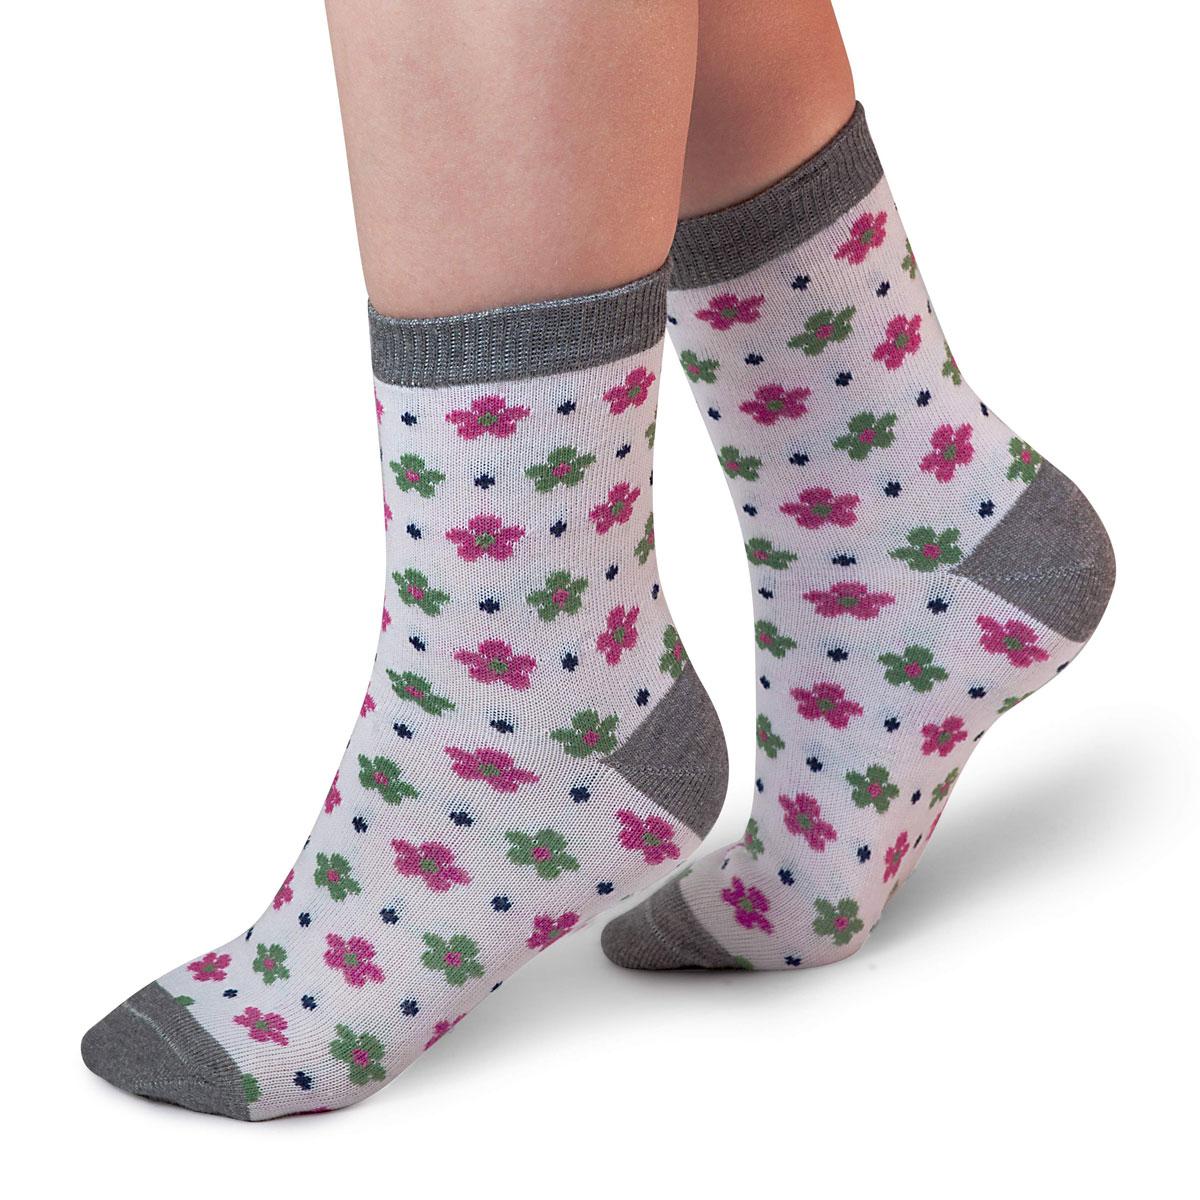 Носки для девочки Idilio, цвет: белый, зеленый. SG08. Размер 30/32 idilio idilio l 08